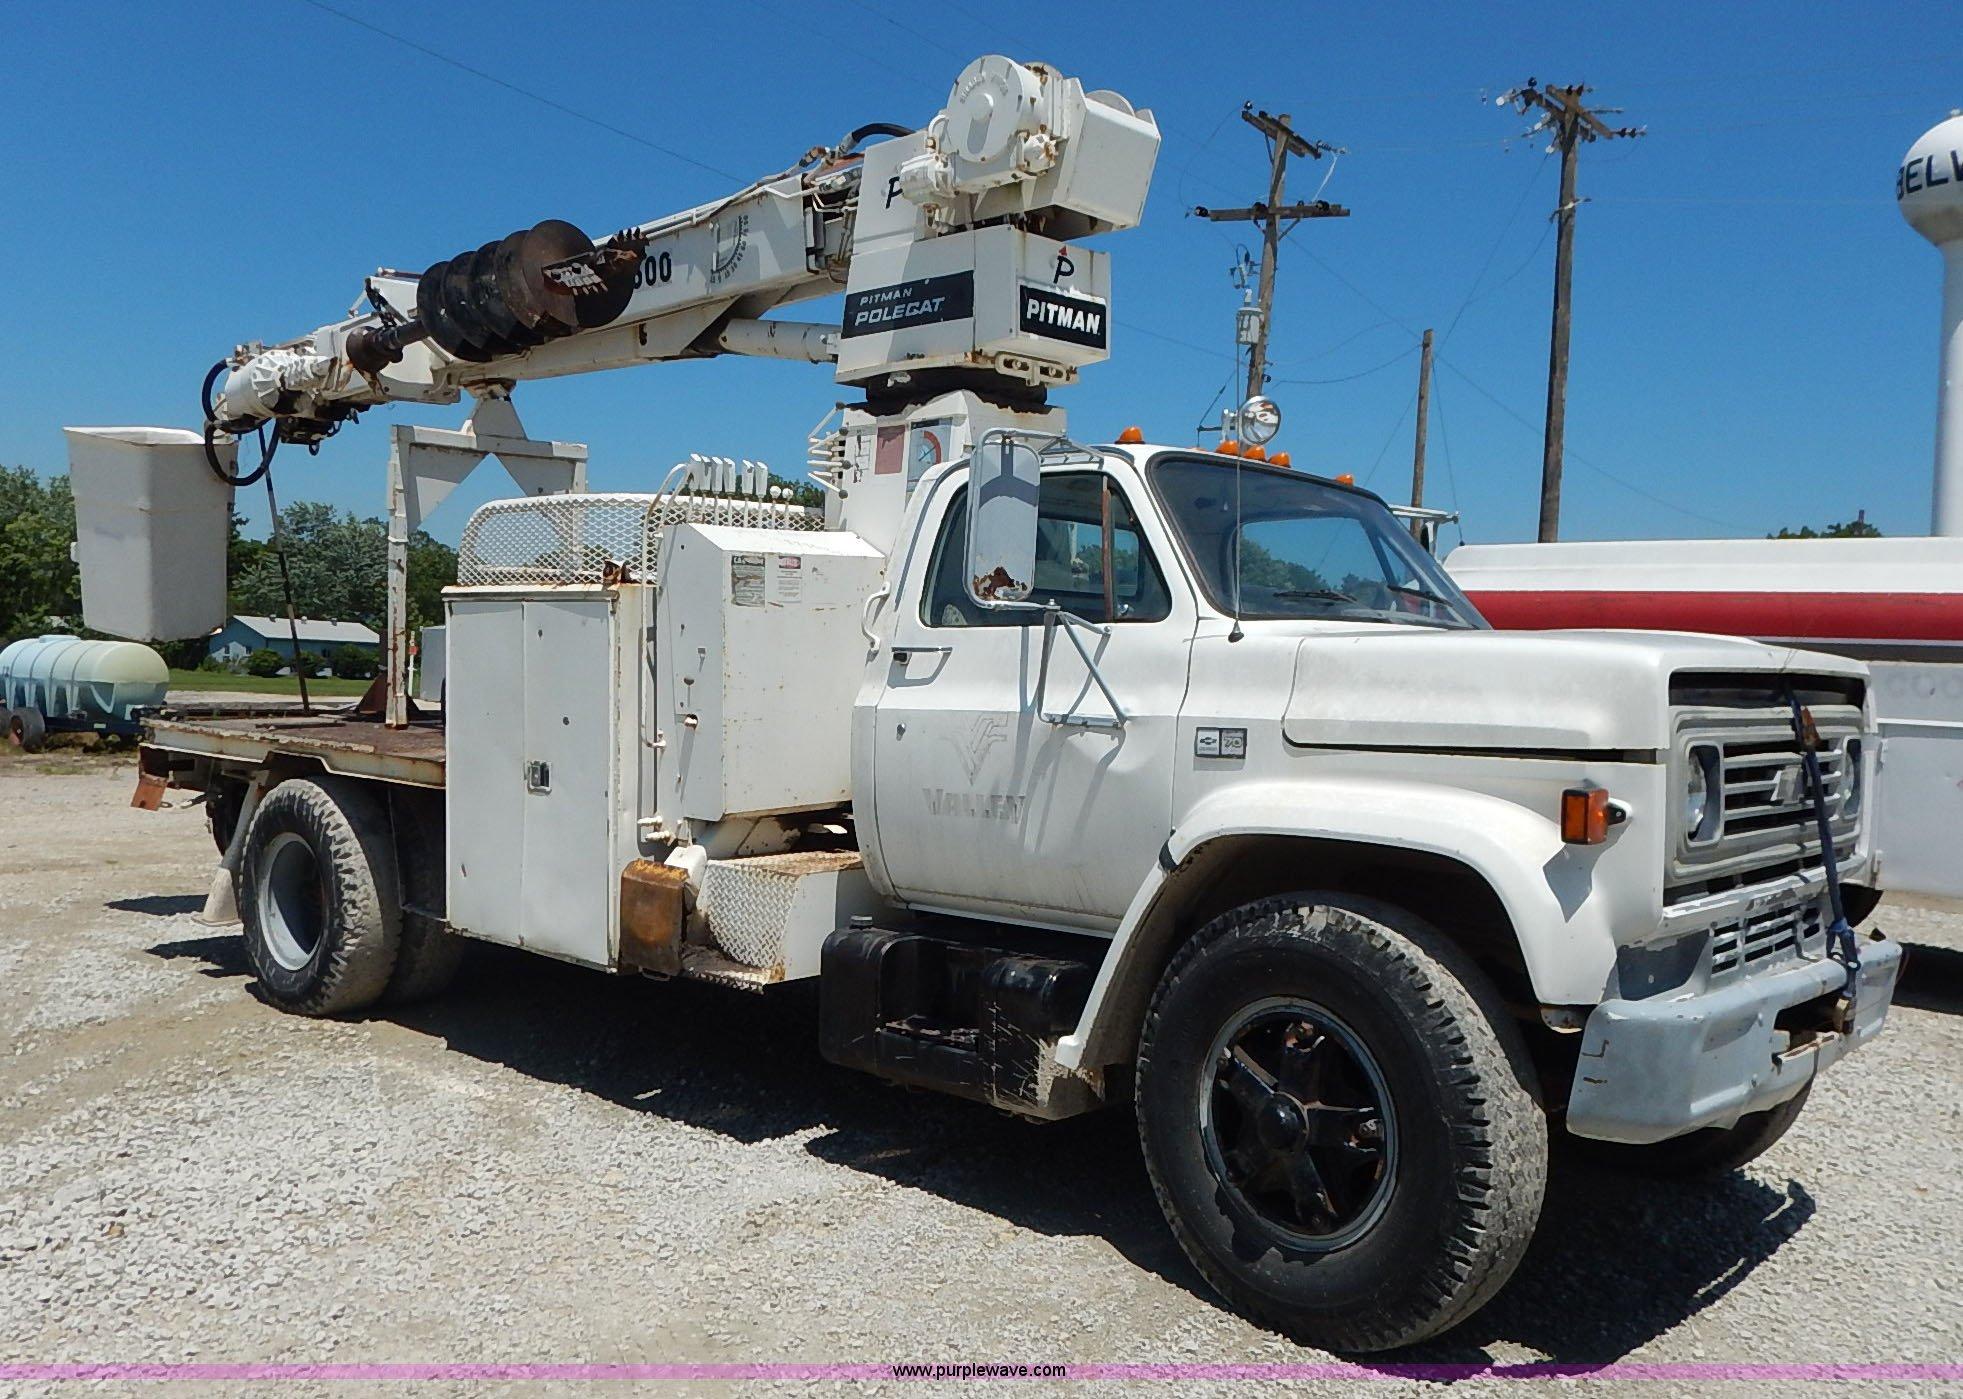 1983 chevrolet kodiak derrick digger truck item j3879 so rh purplewave com pitman polecat service manual Pitman Boom Parts